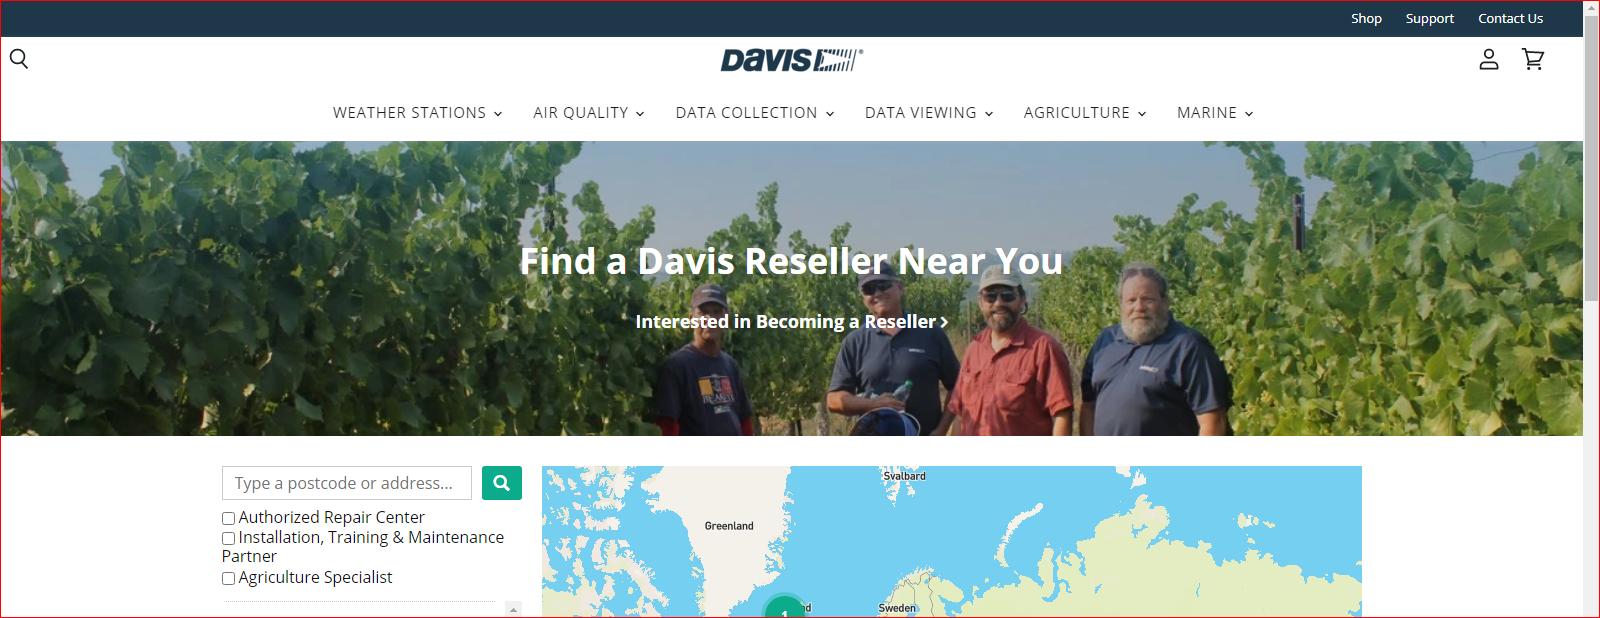 Philippine Distributor of Davis Instruments products